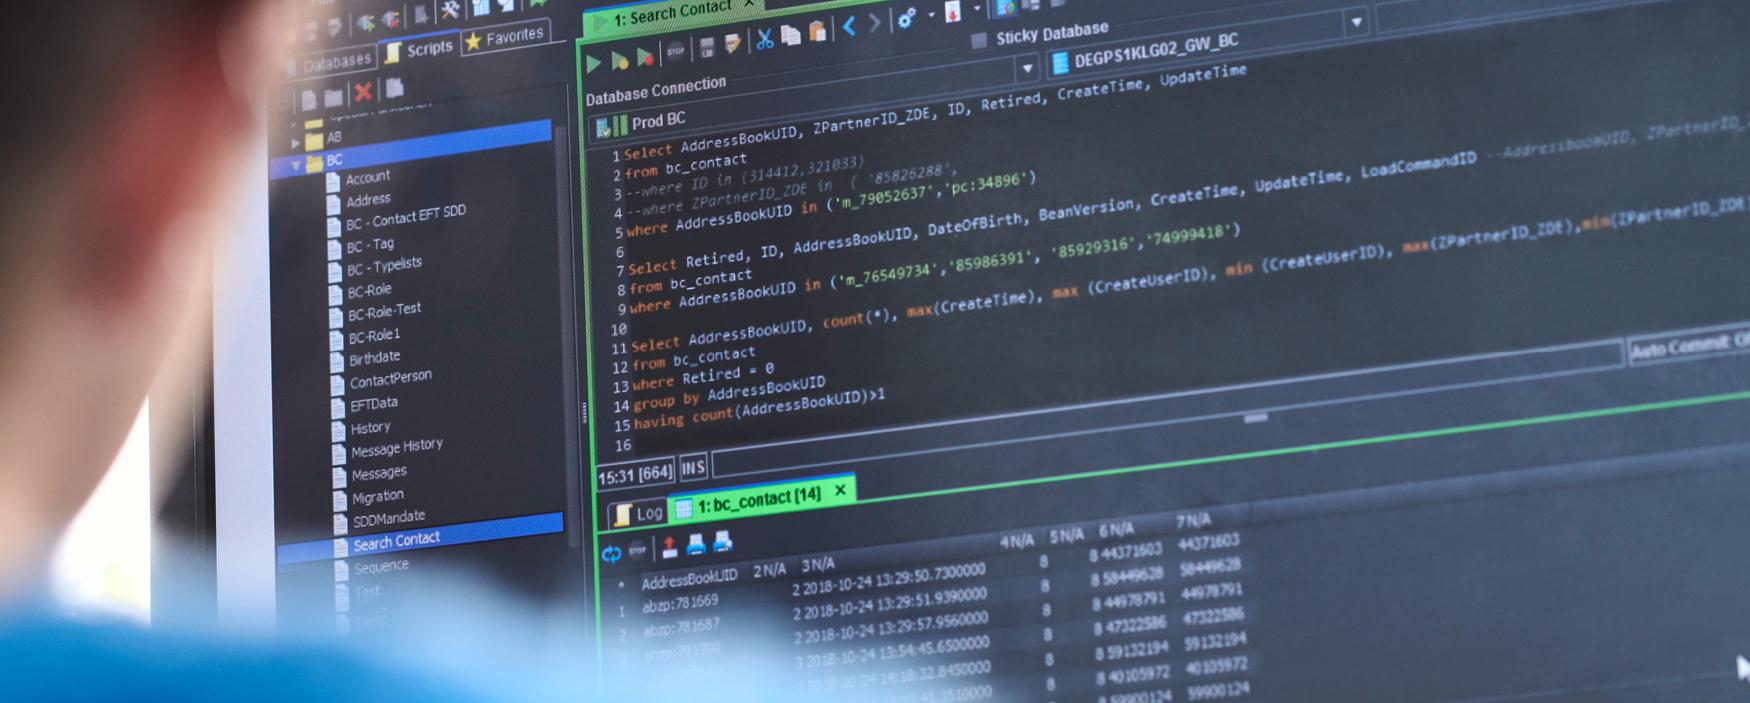 Mathematisch Technischer Software Entwickler (MATSE)